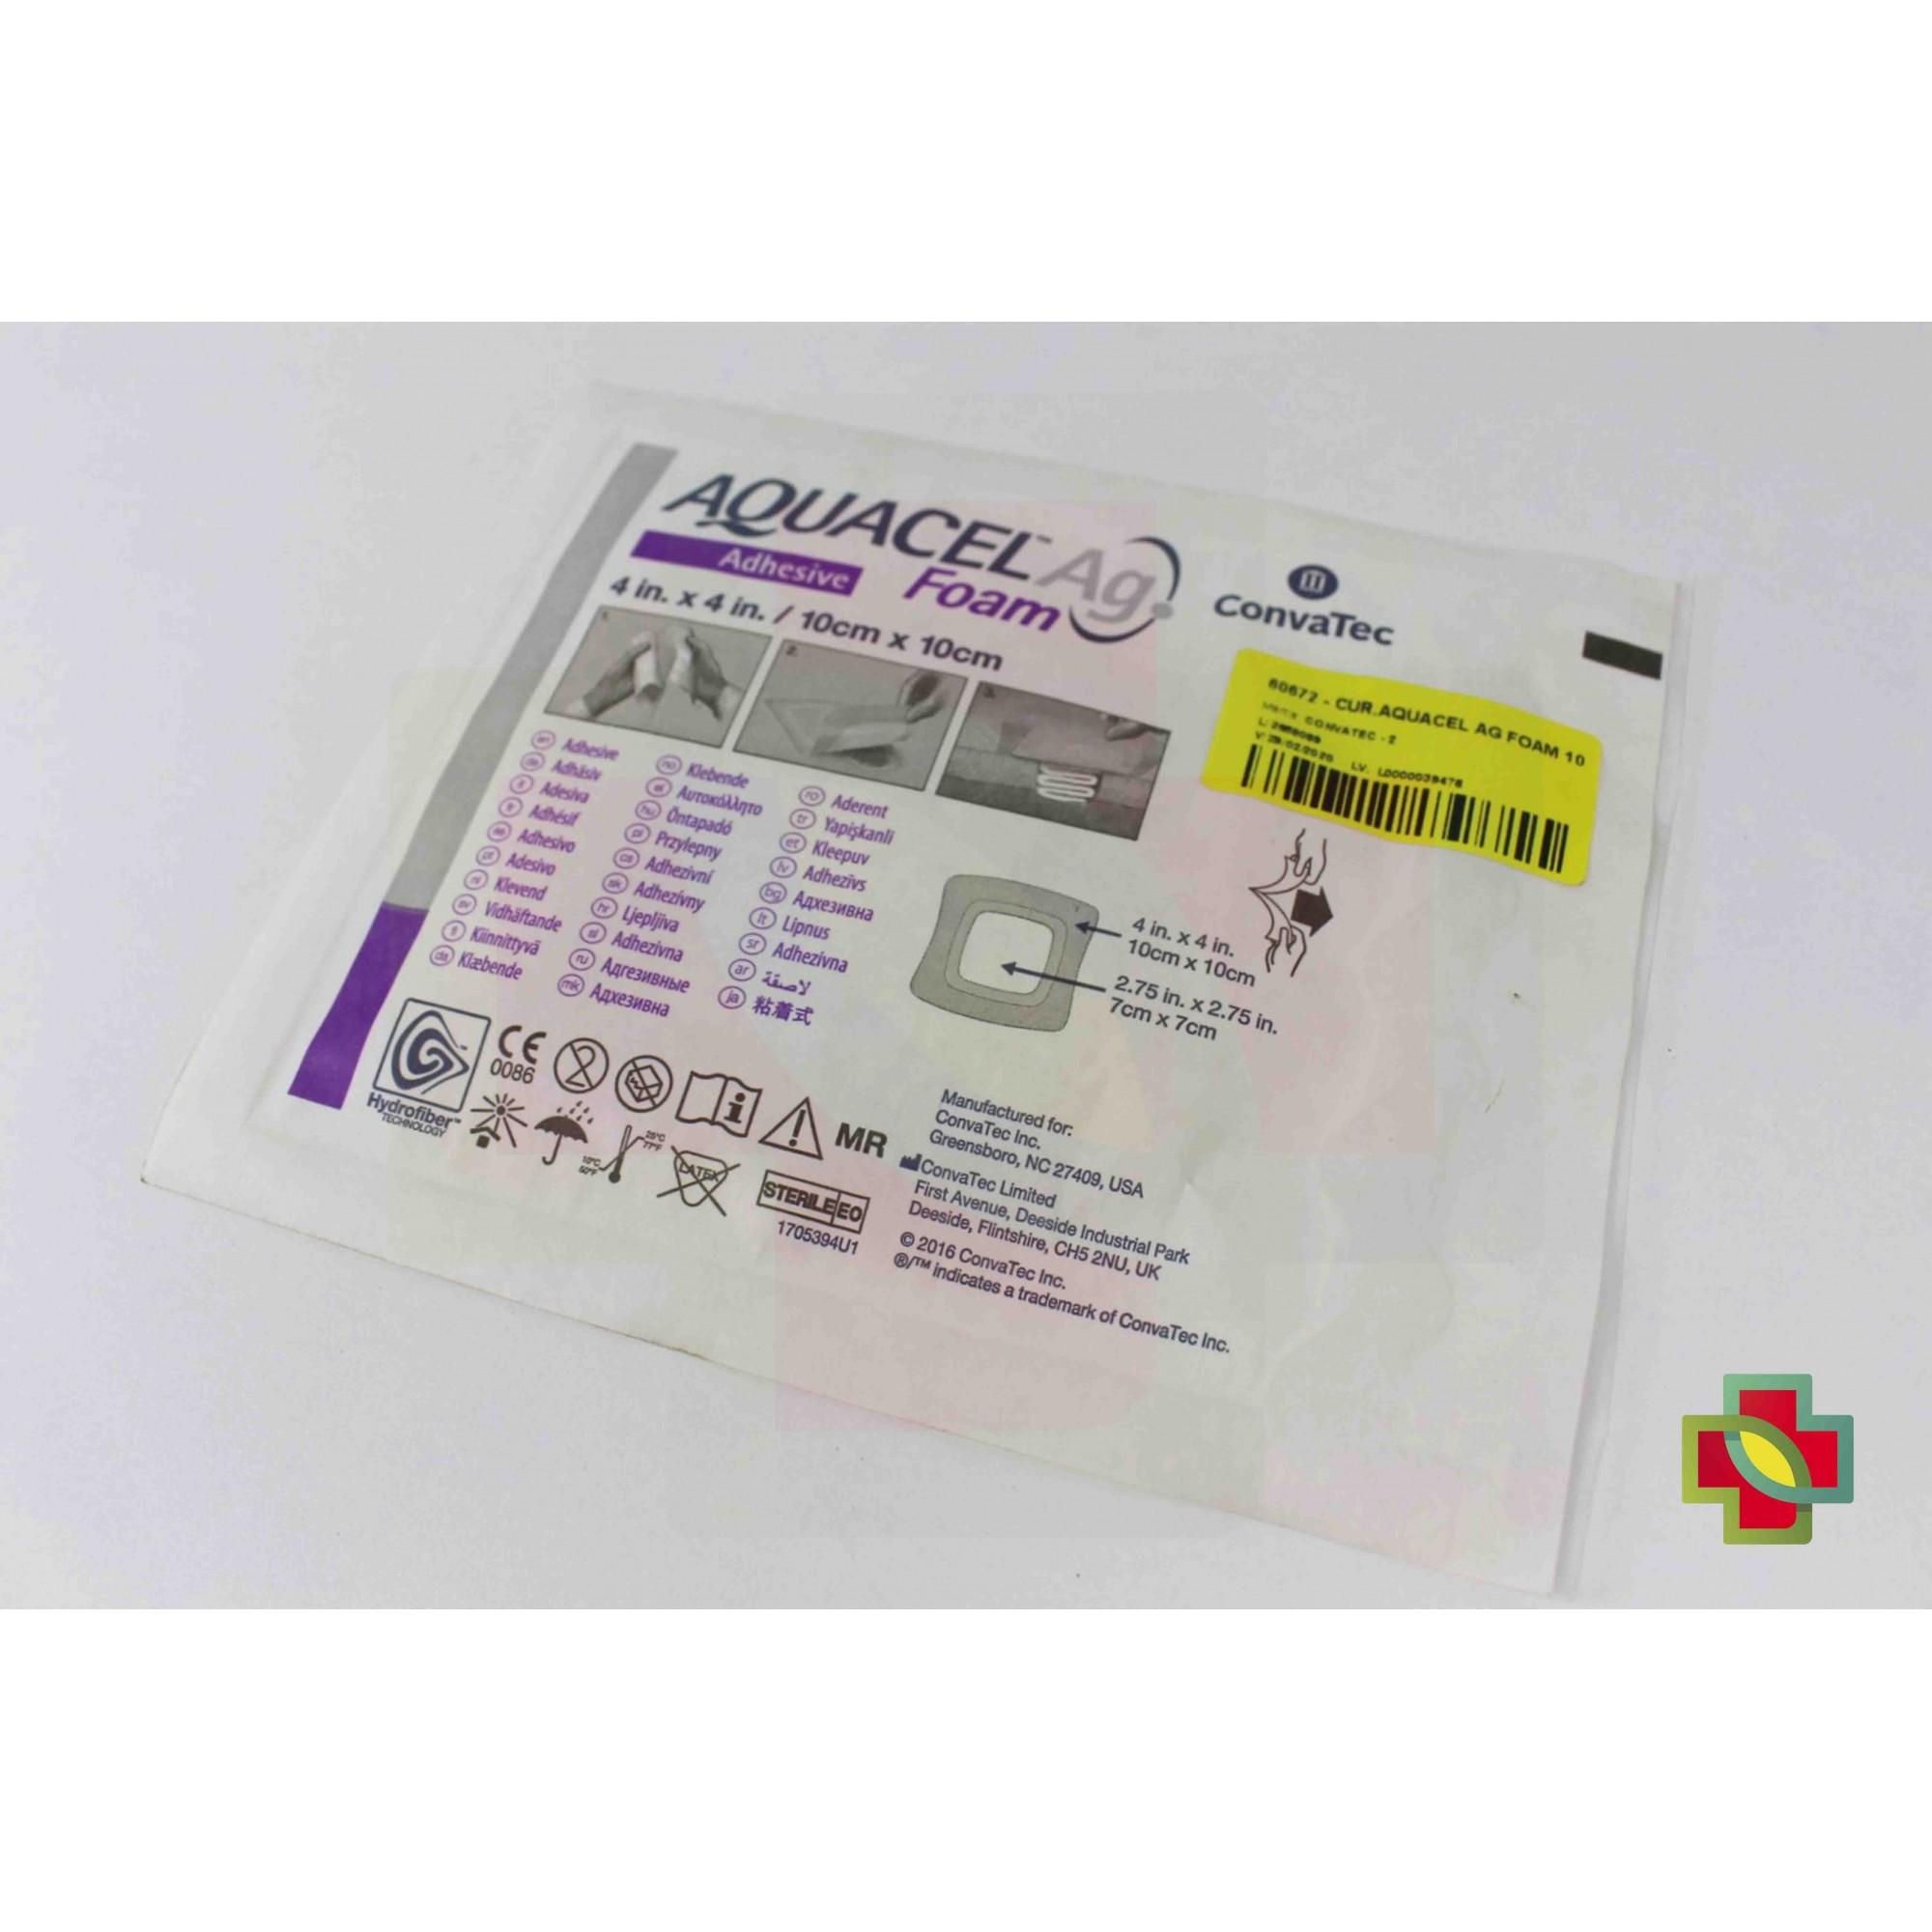 CURATIVO AQUACEL AG FOAM ADESIVO 10 X 10  (CX C/ 10 UND.) 420681 - CONVATEC